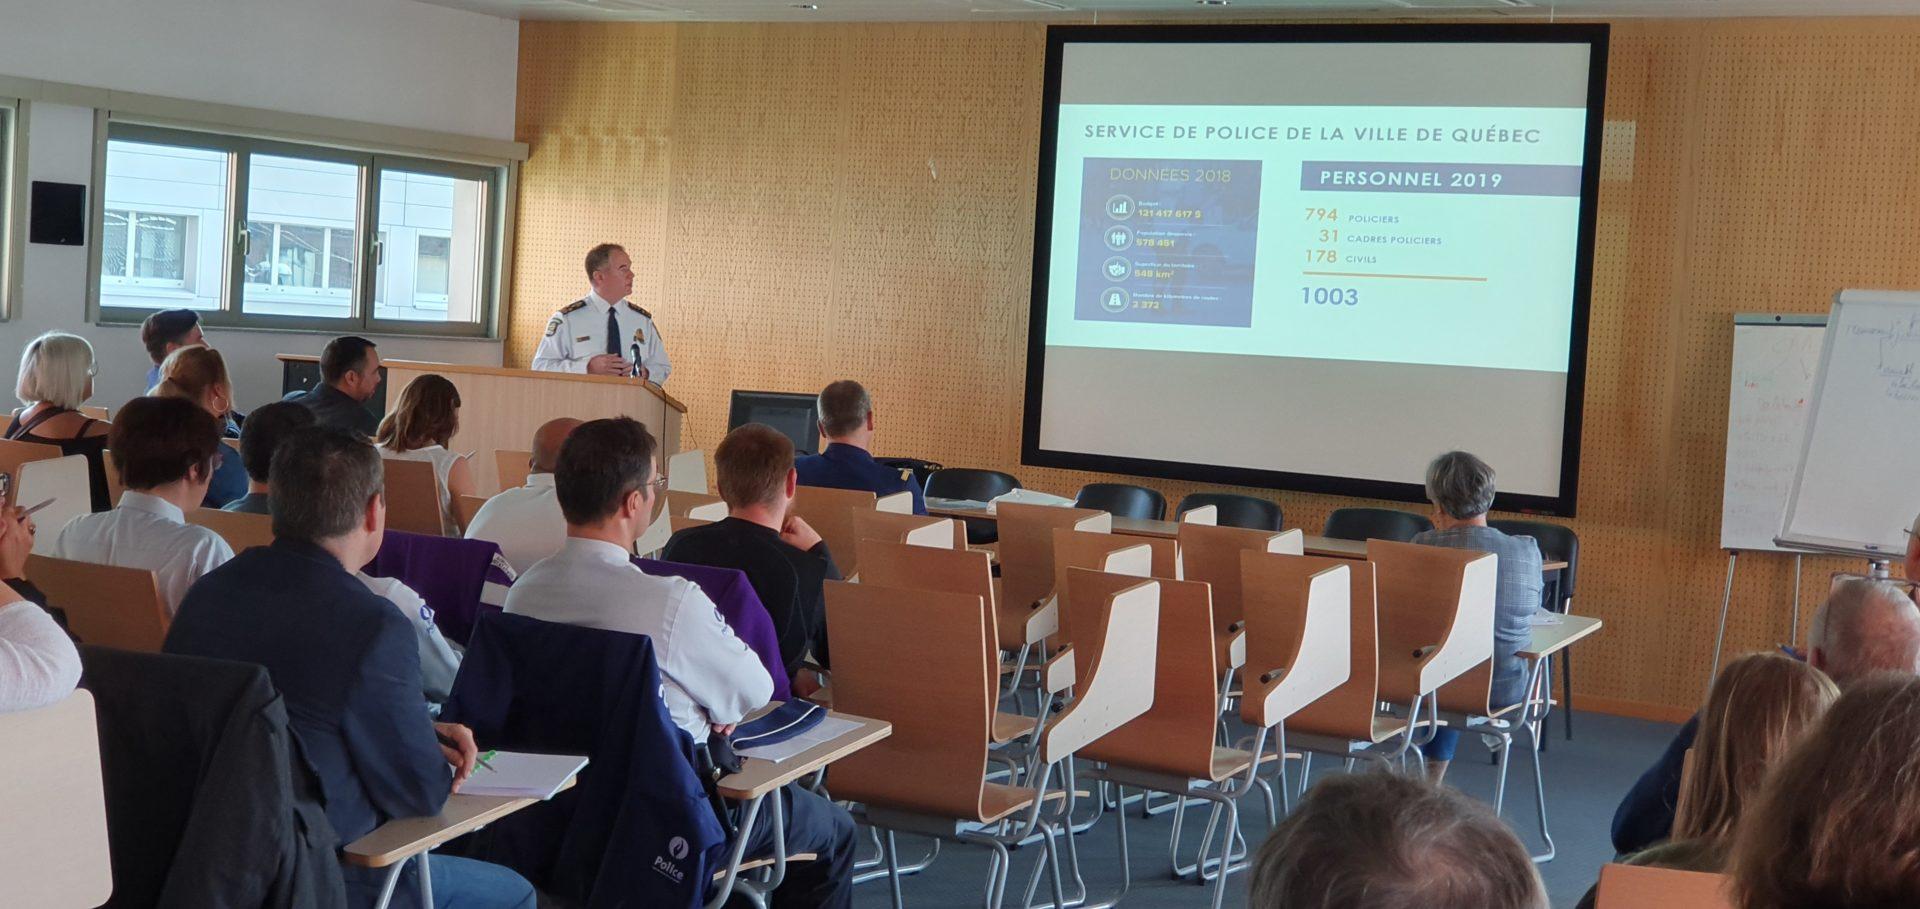 Octobre 2020 - Namur - Visite du chef de la police de Québec